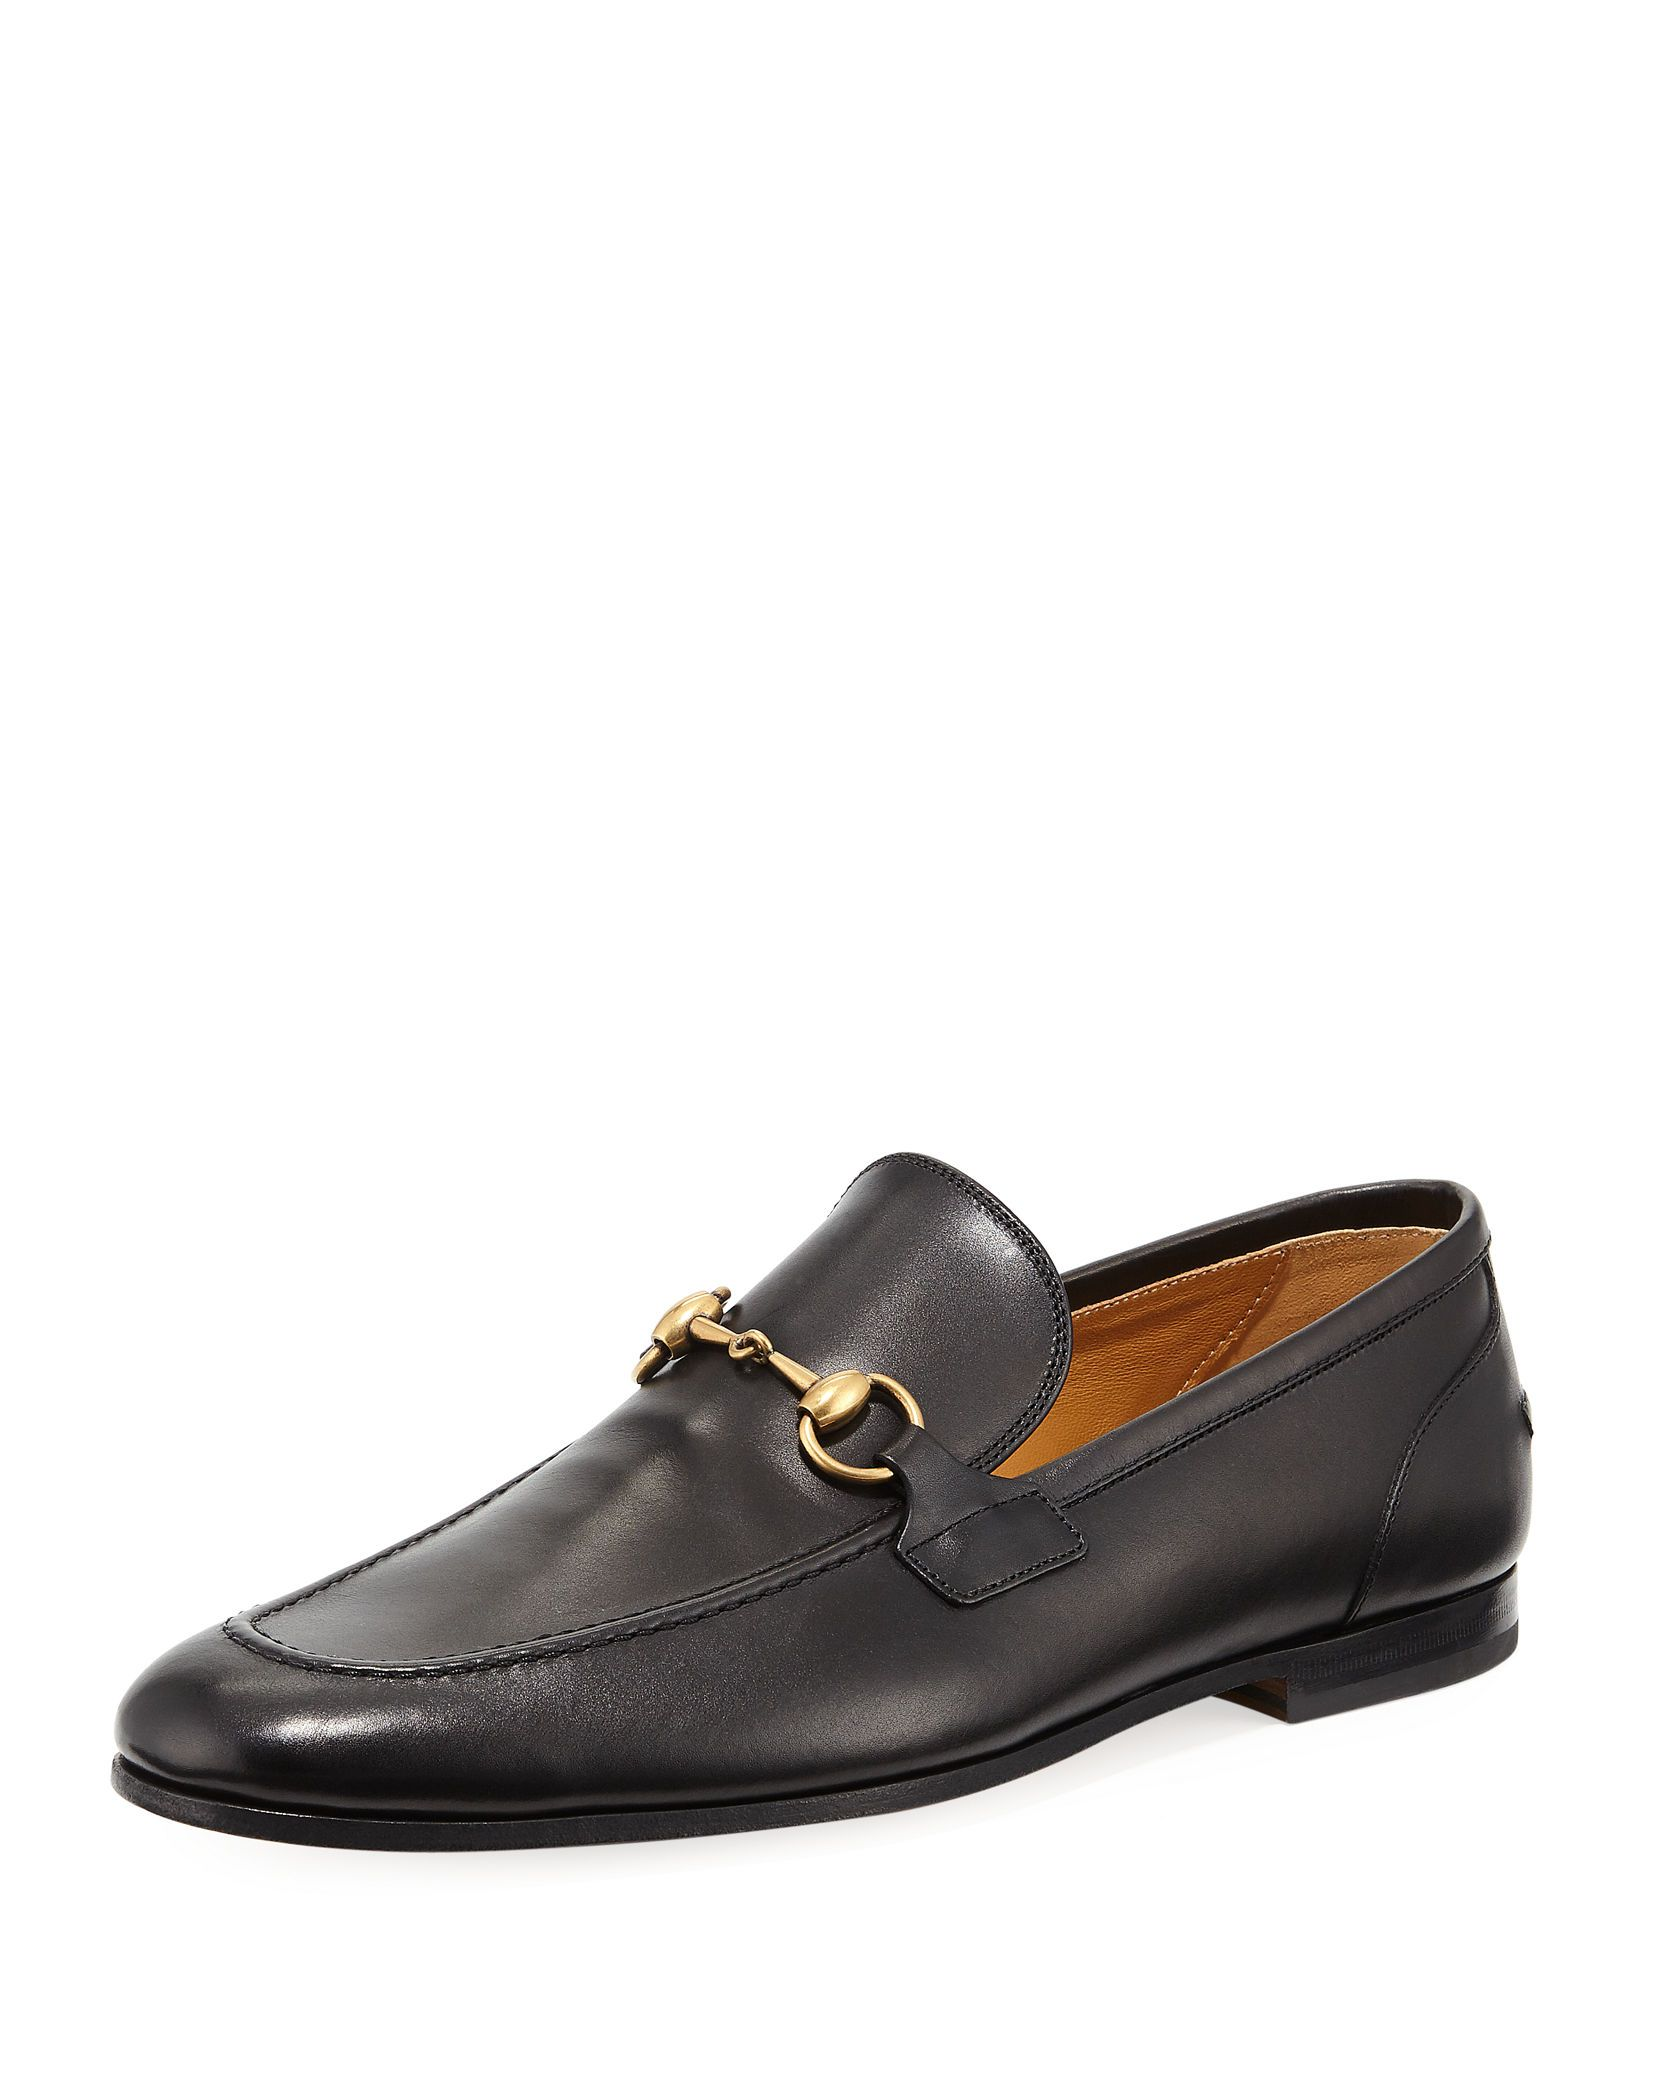 7e11226ca1f Gucci Men s Jordaan Soft Leather Bit-Strap Loafer